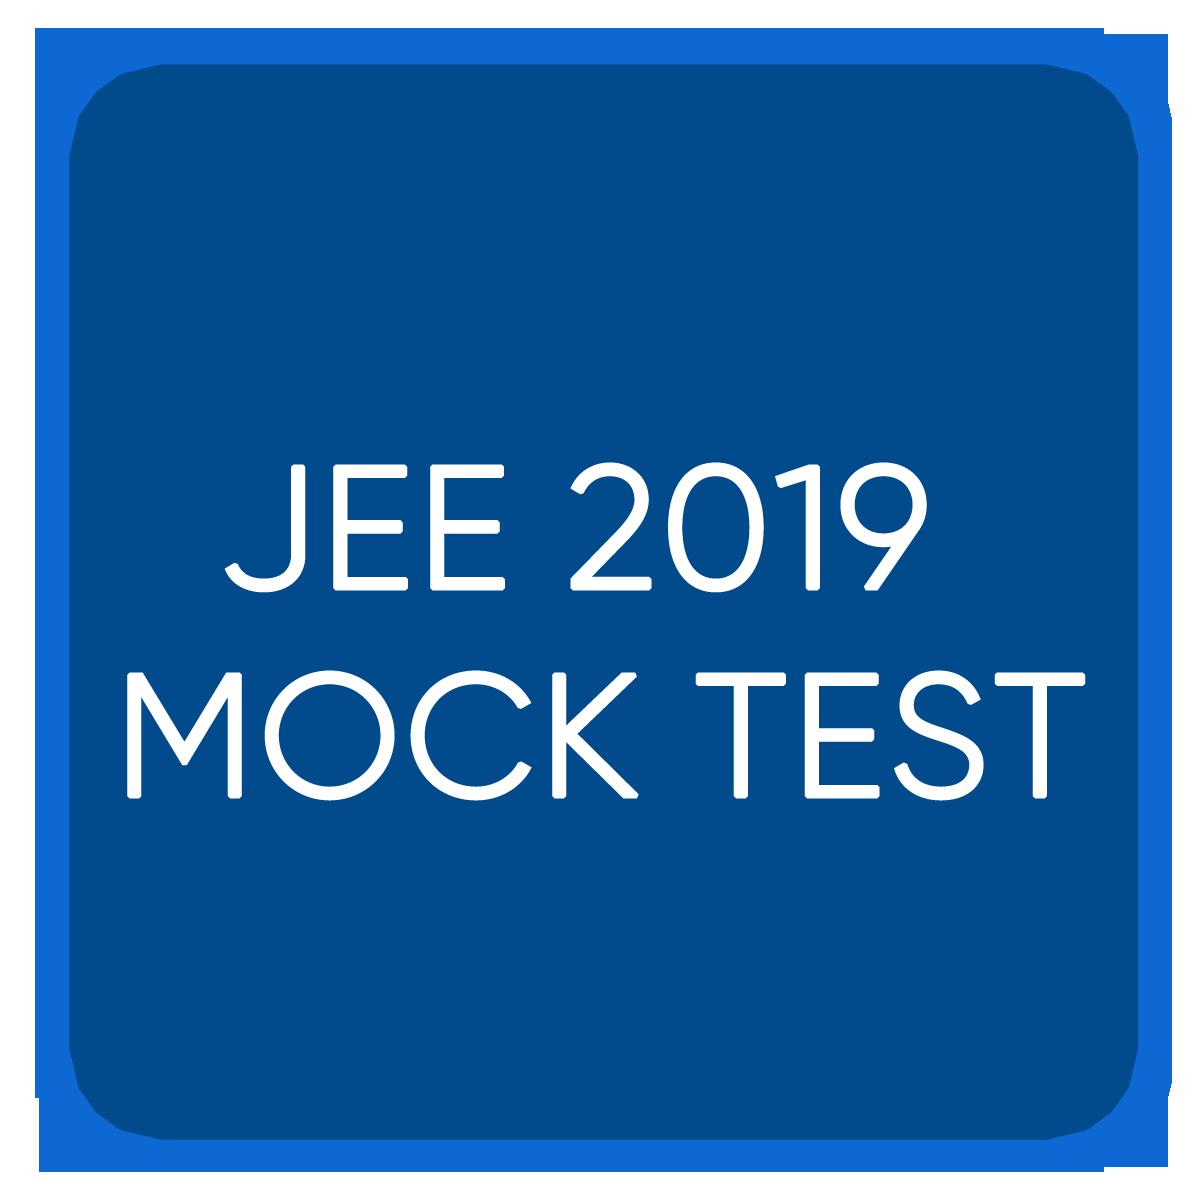 JEE 2019 MOCK TEST